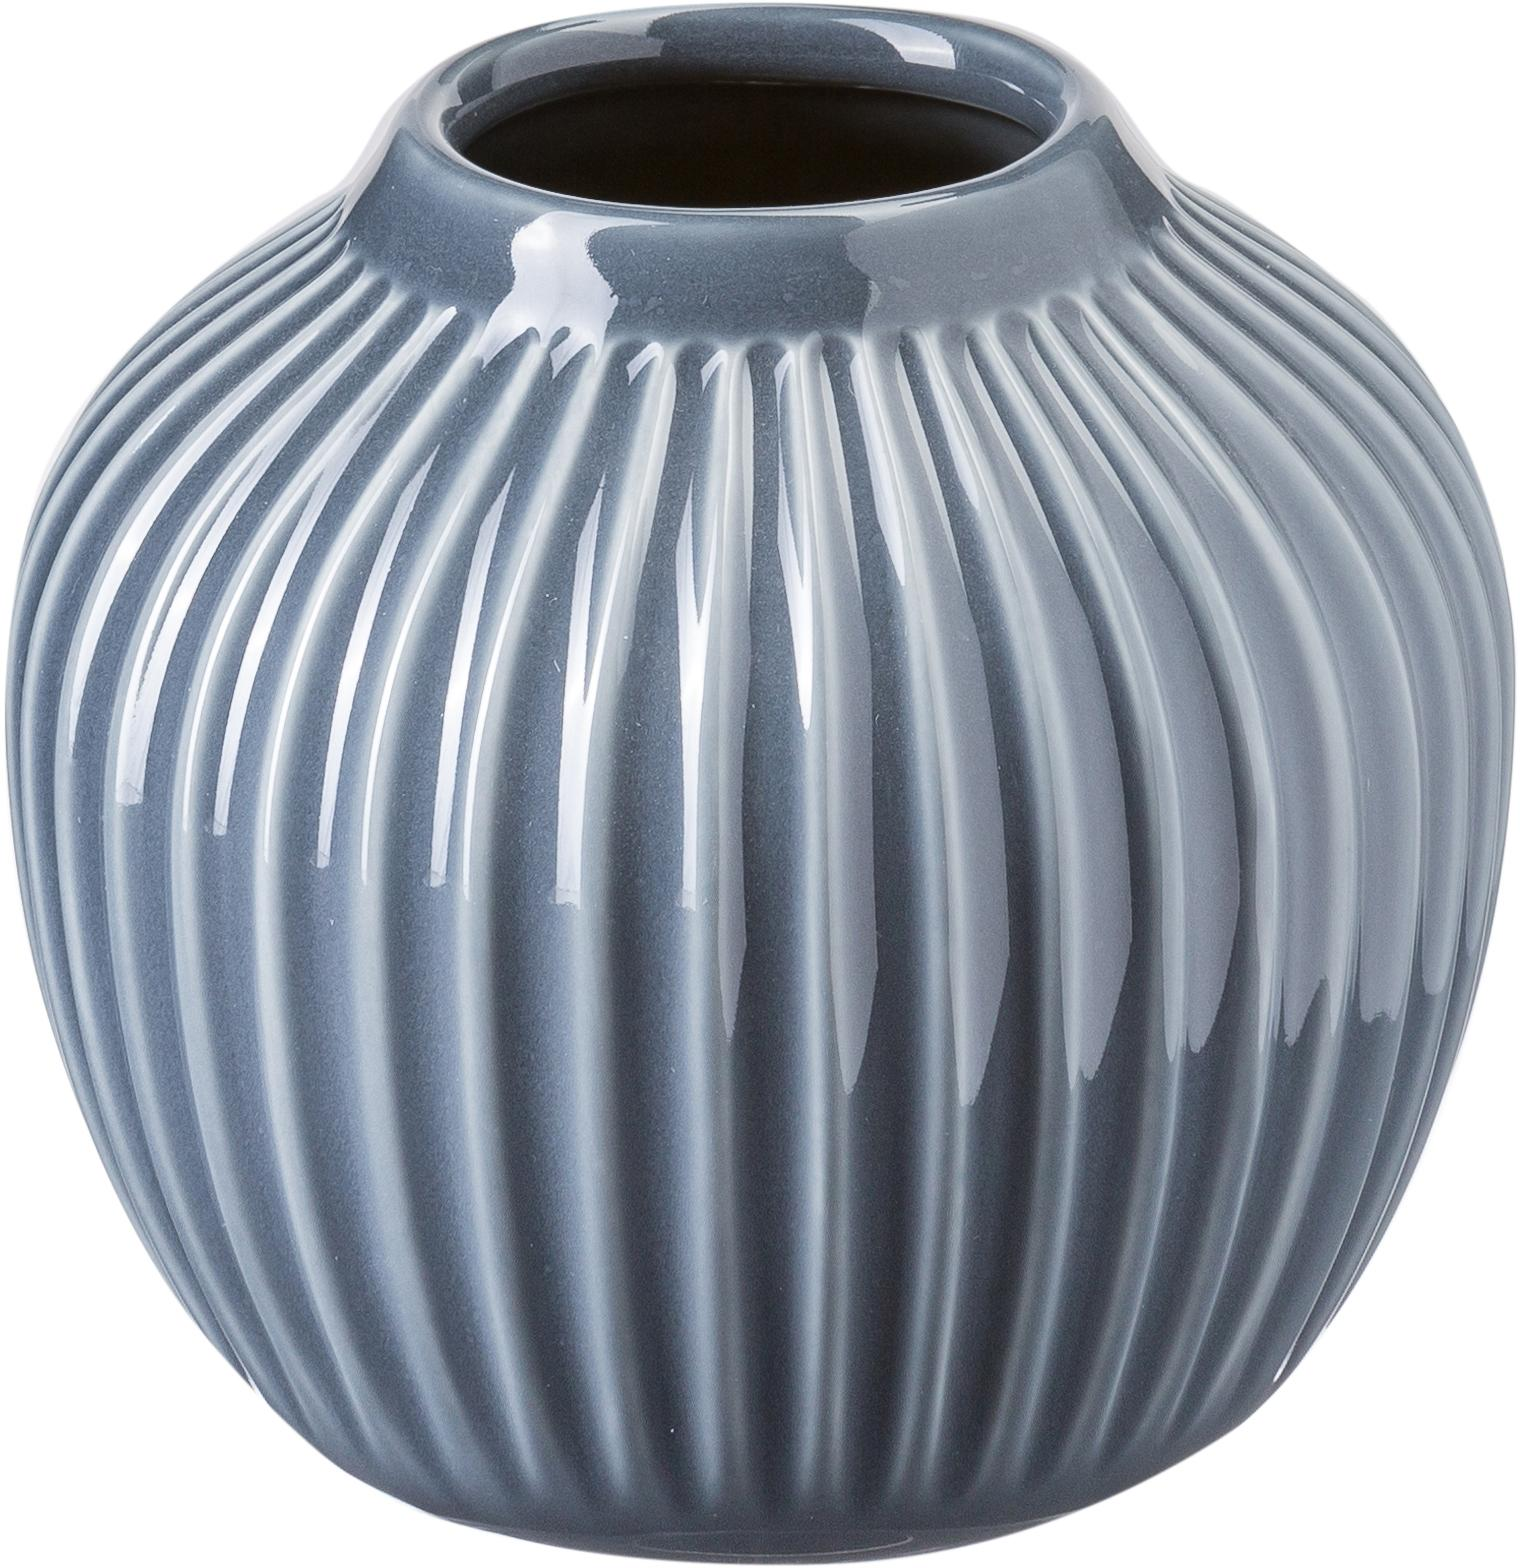 Vaso di design fatto a mano Hammershøi, Porcellana, Antracite, Ø 14 x Alt.13 cm